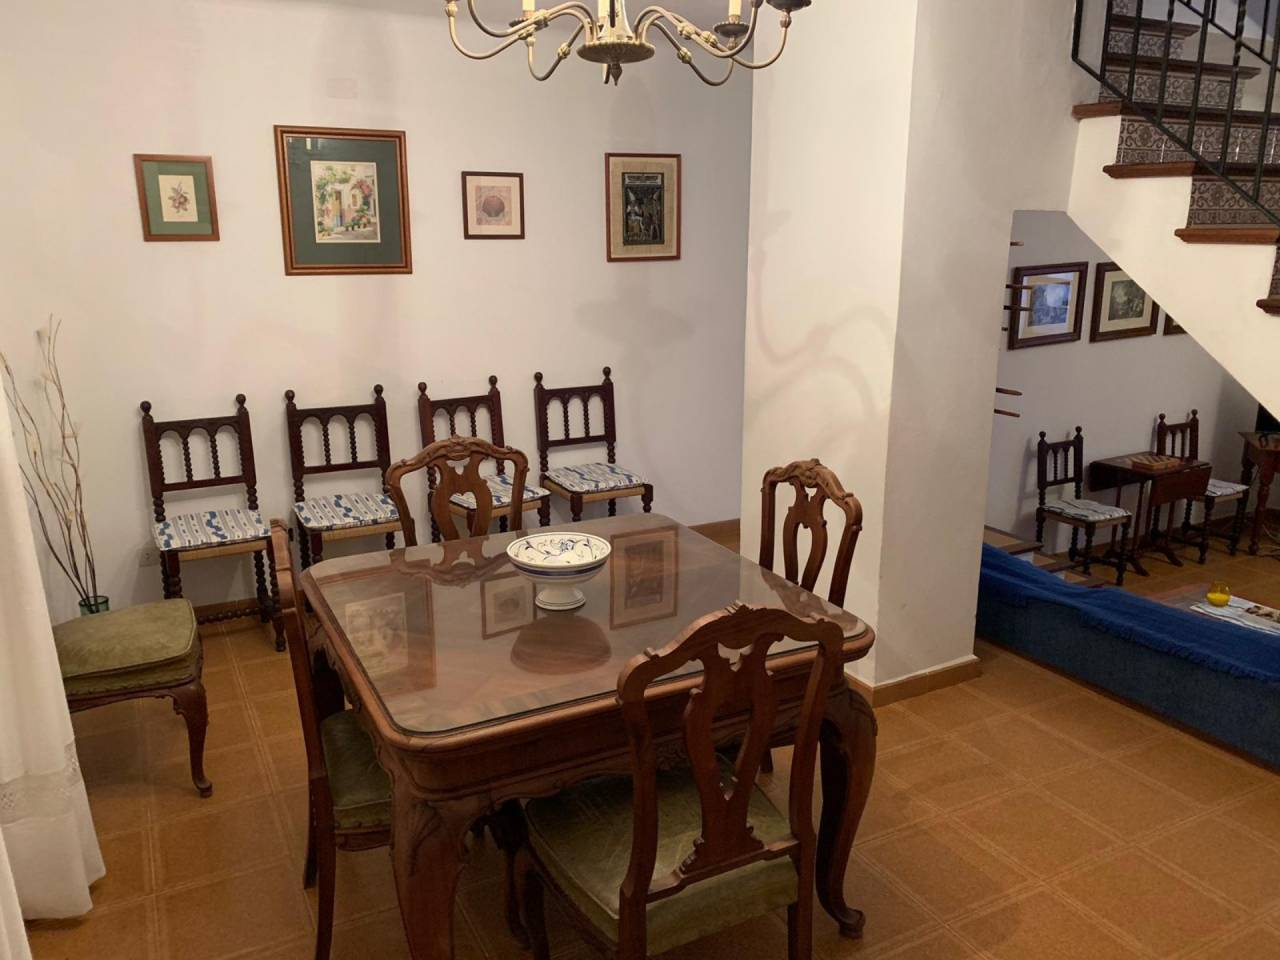 Location Maison  Calle galiota. Contrato mínimo 1 año. se alquila este completísimo chalet ados